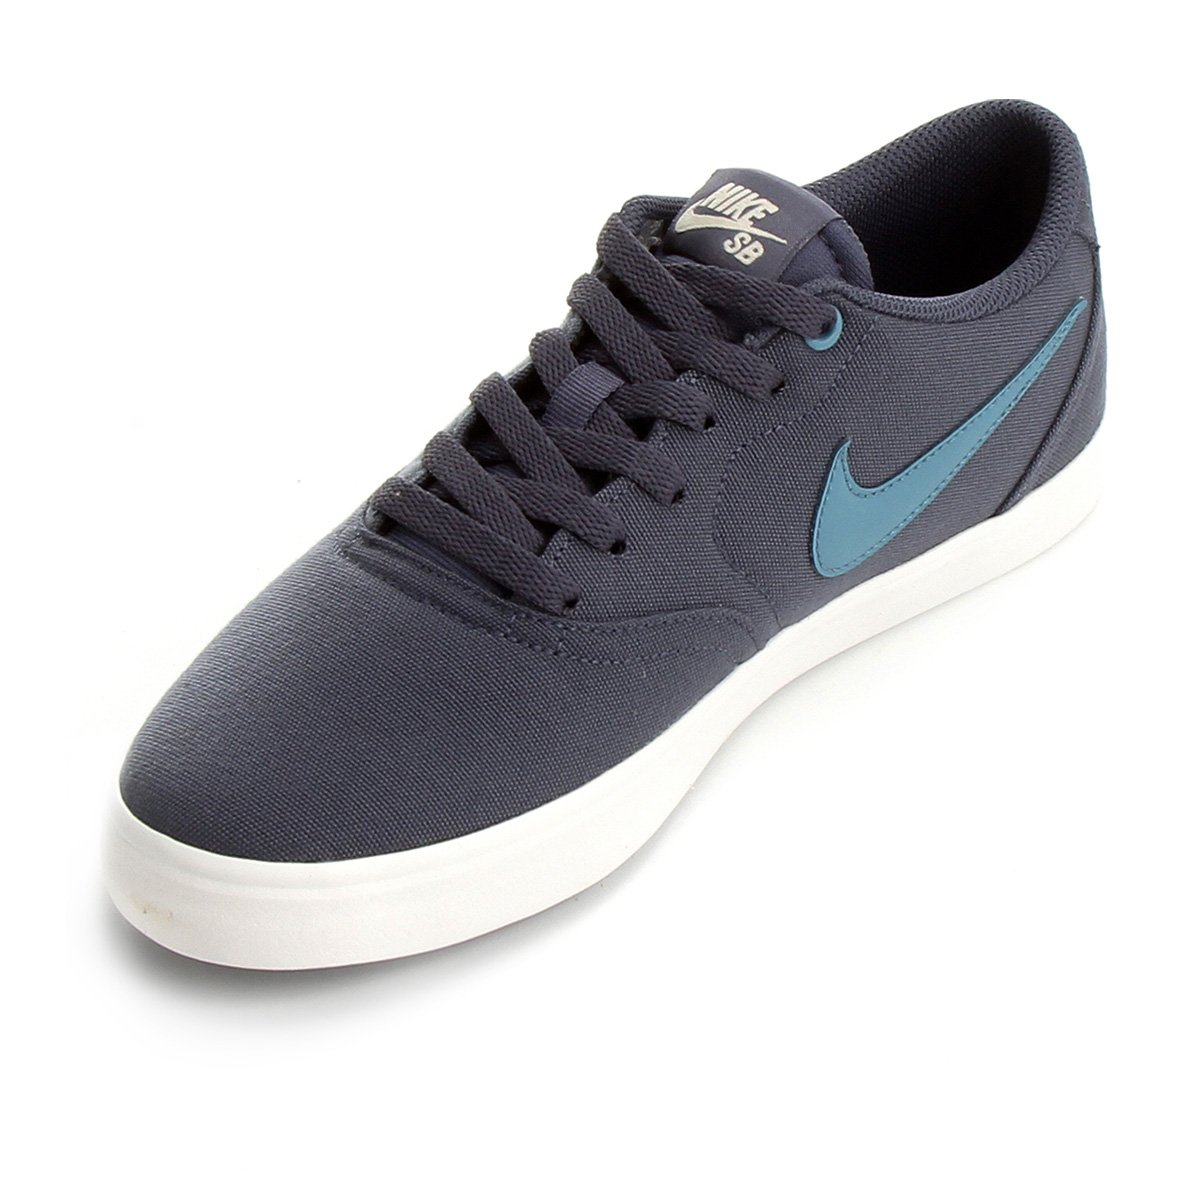 ... Tênis Nike Sb Check Solar Cnvs Masculino - Branco e Azul - Compre . 790c094b0470f